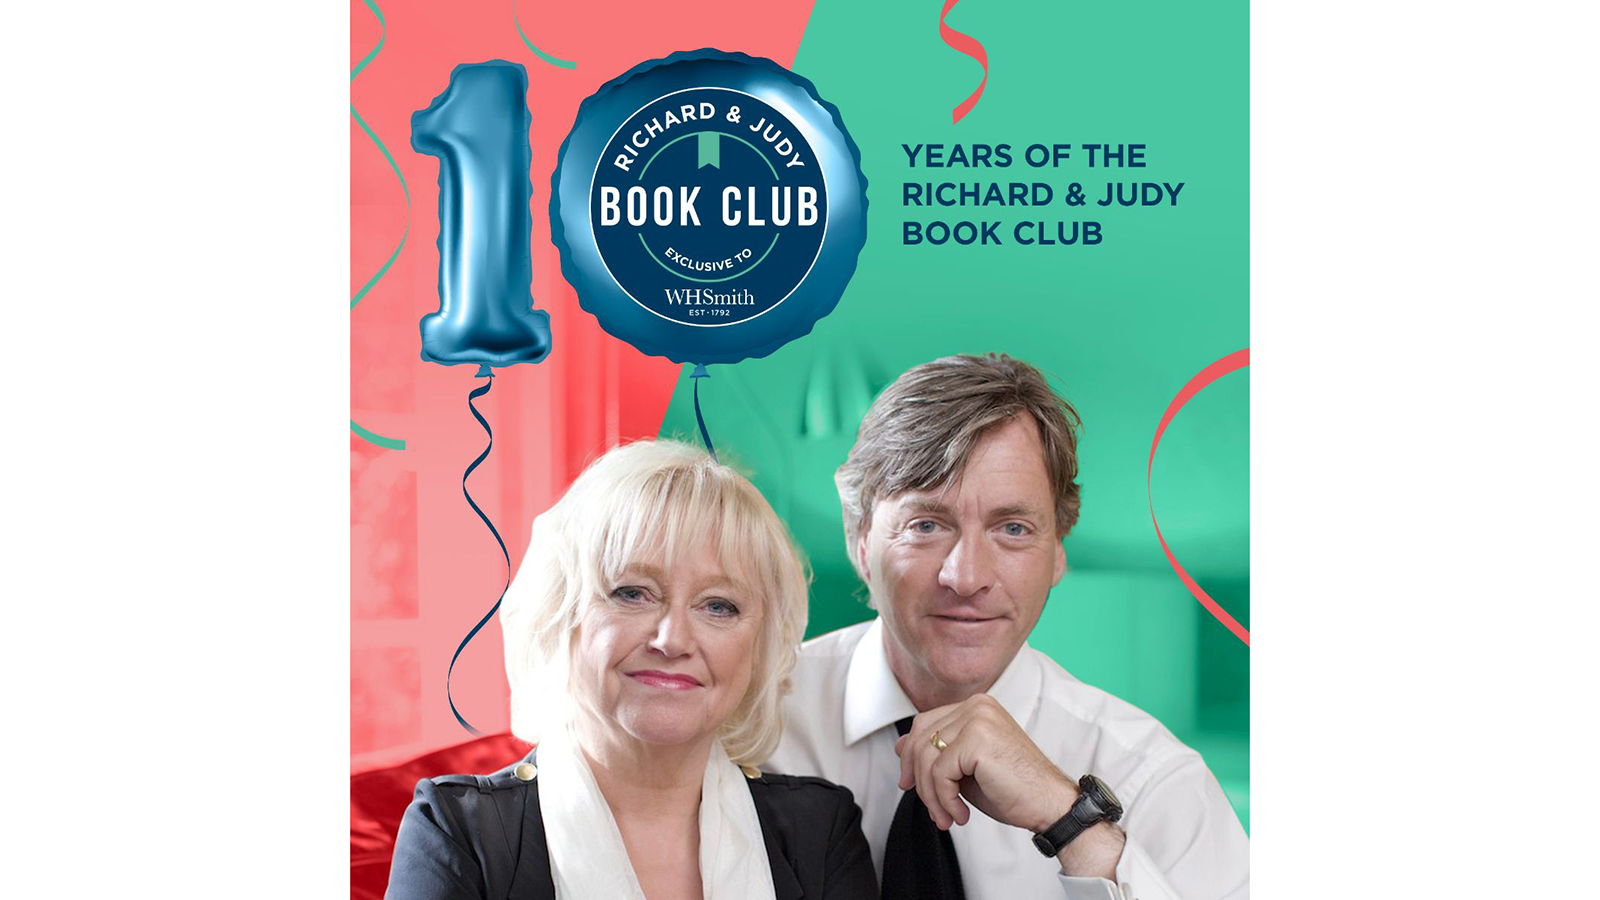 Richard Madeley judy finnigan book club